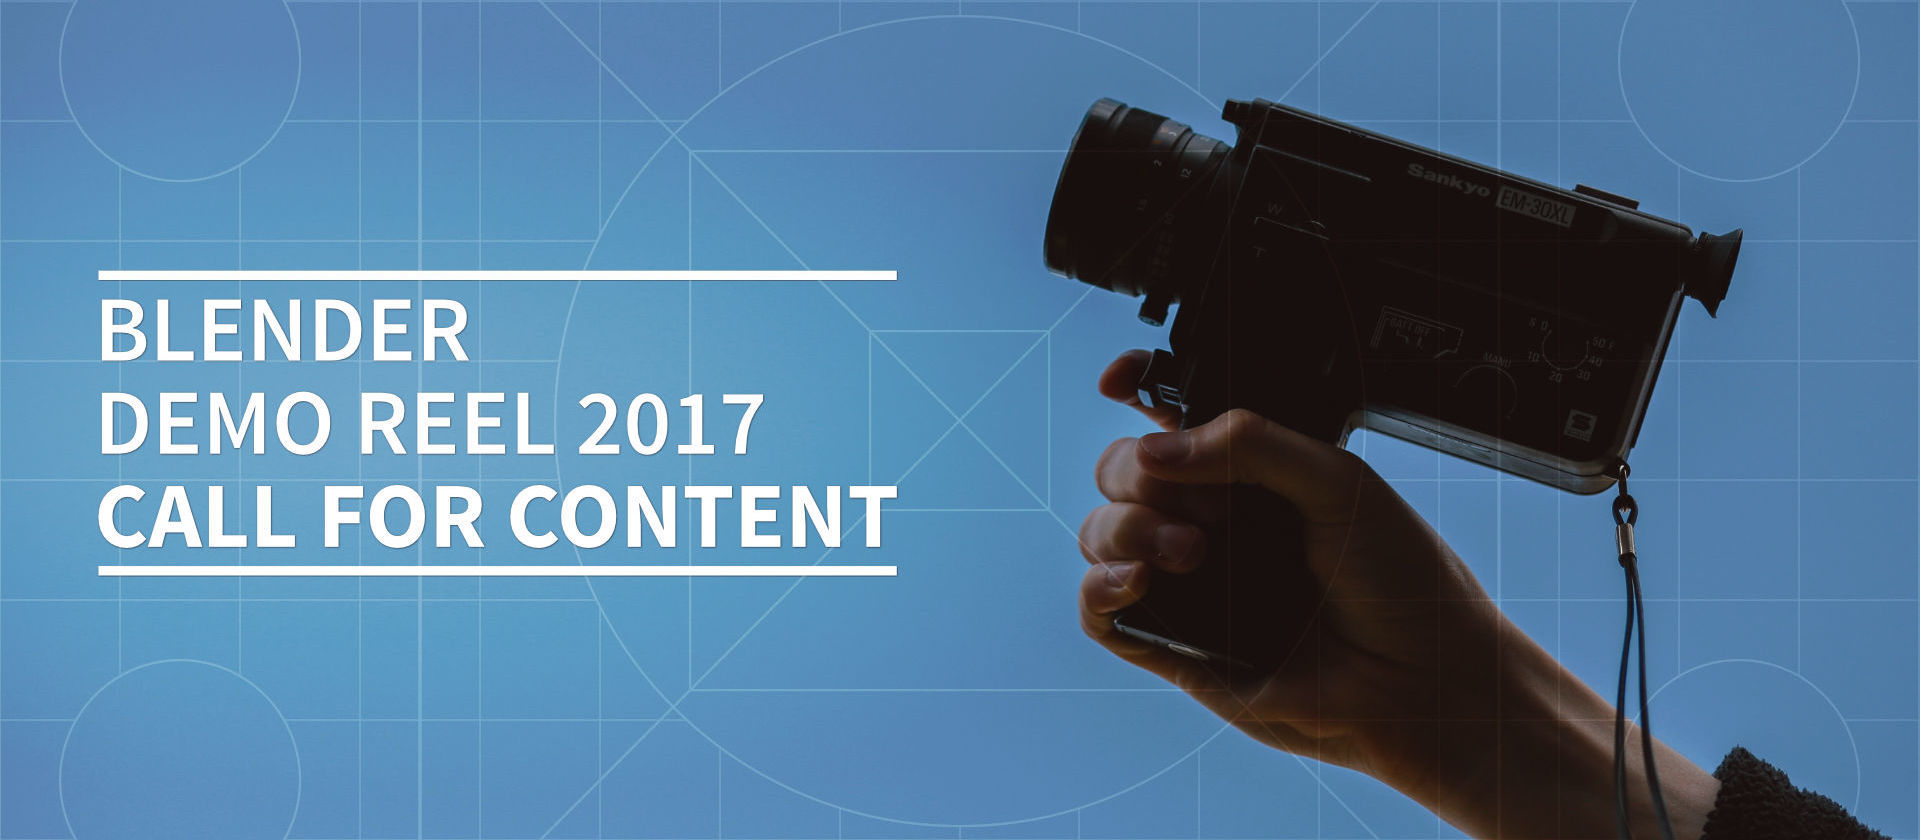 Blender :: CALL FOR CONTENT - Blender Demo Reel 2017